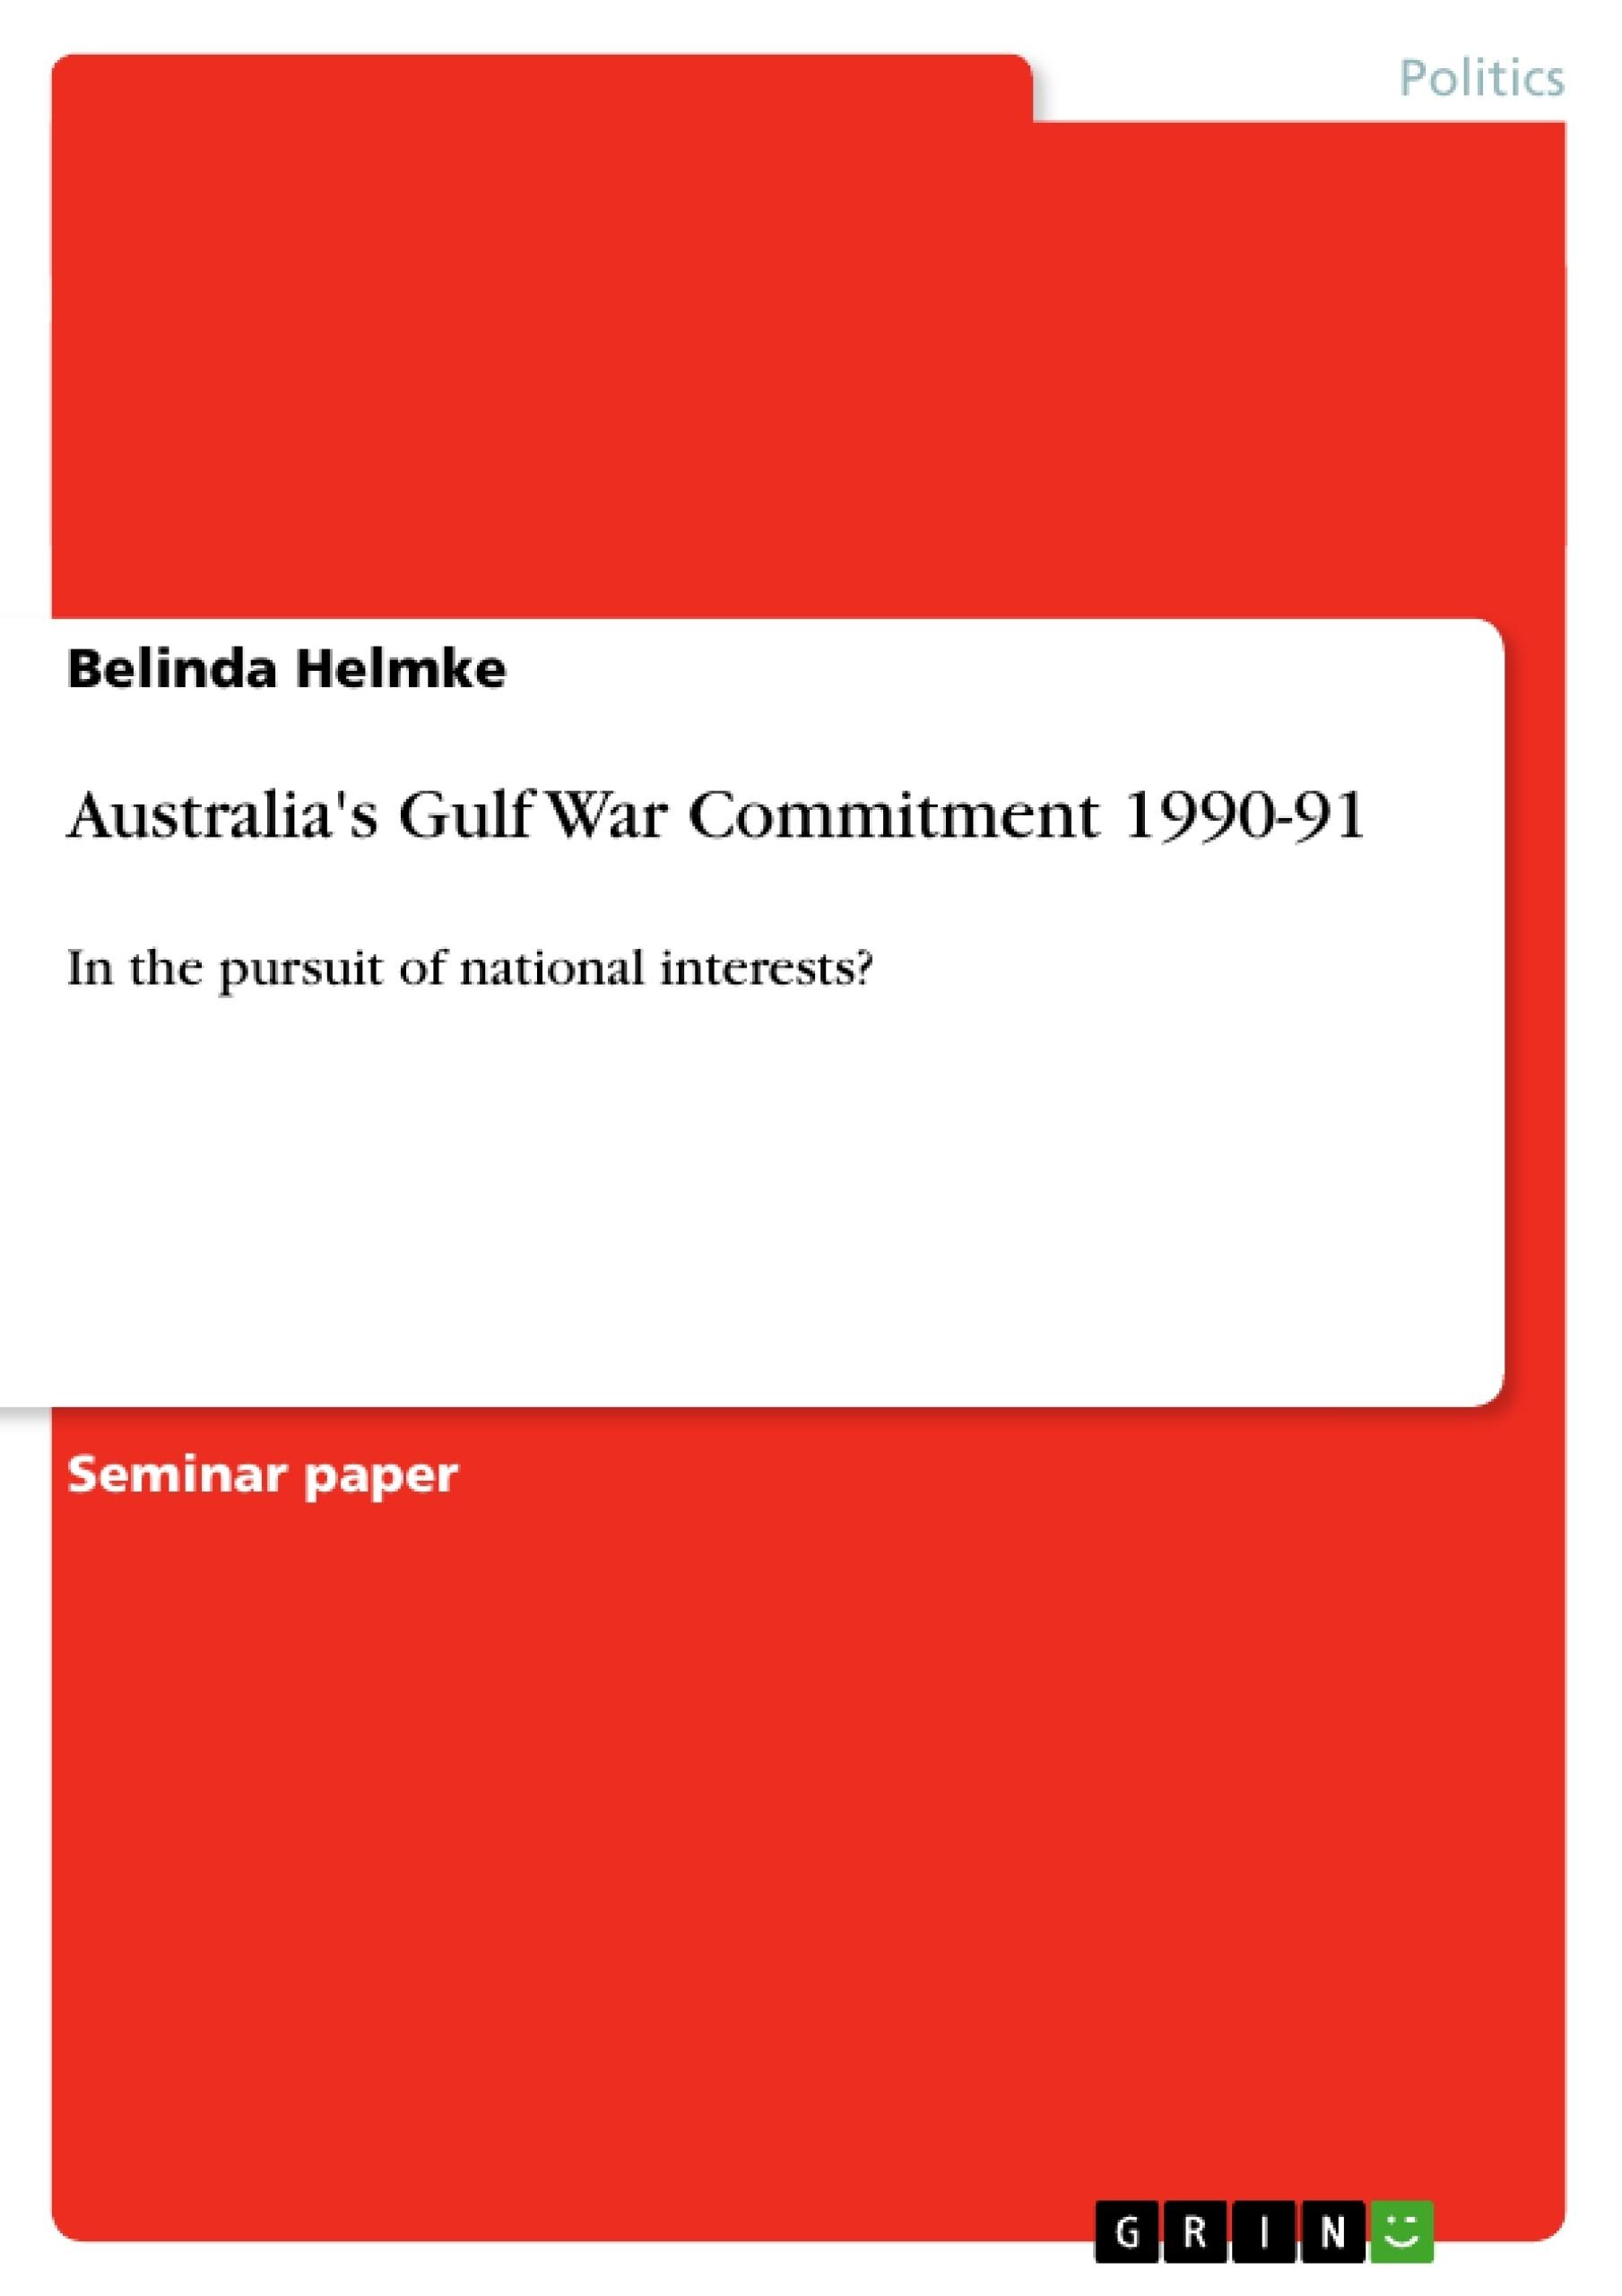 Title: Australia's Gulf War Commitment 1990-91